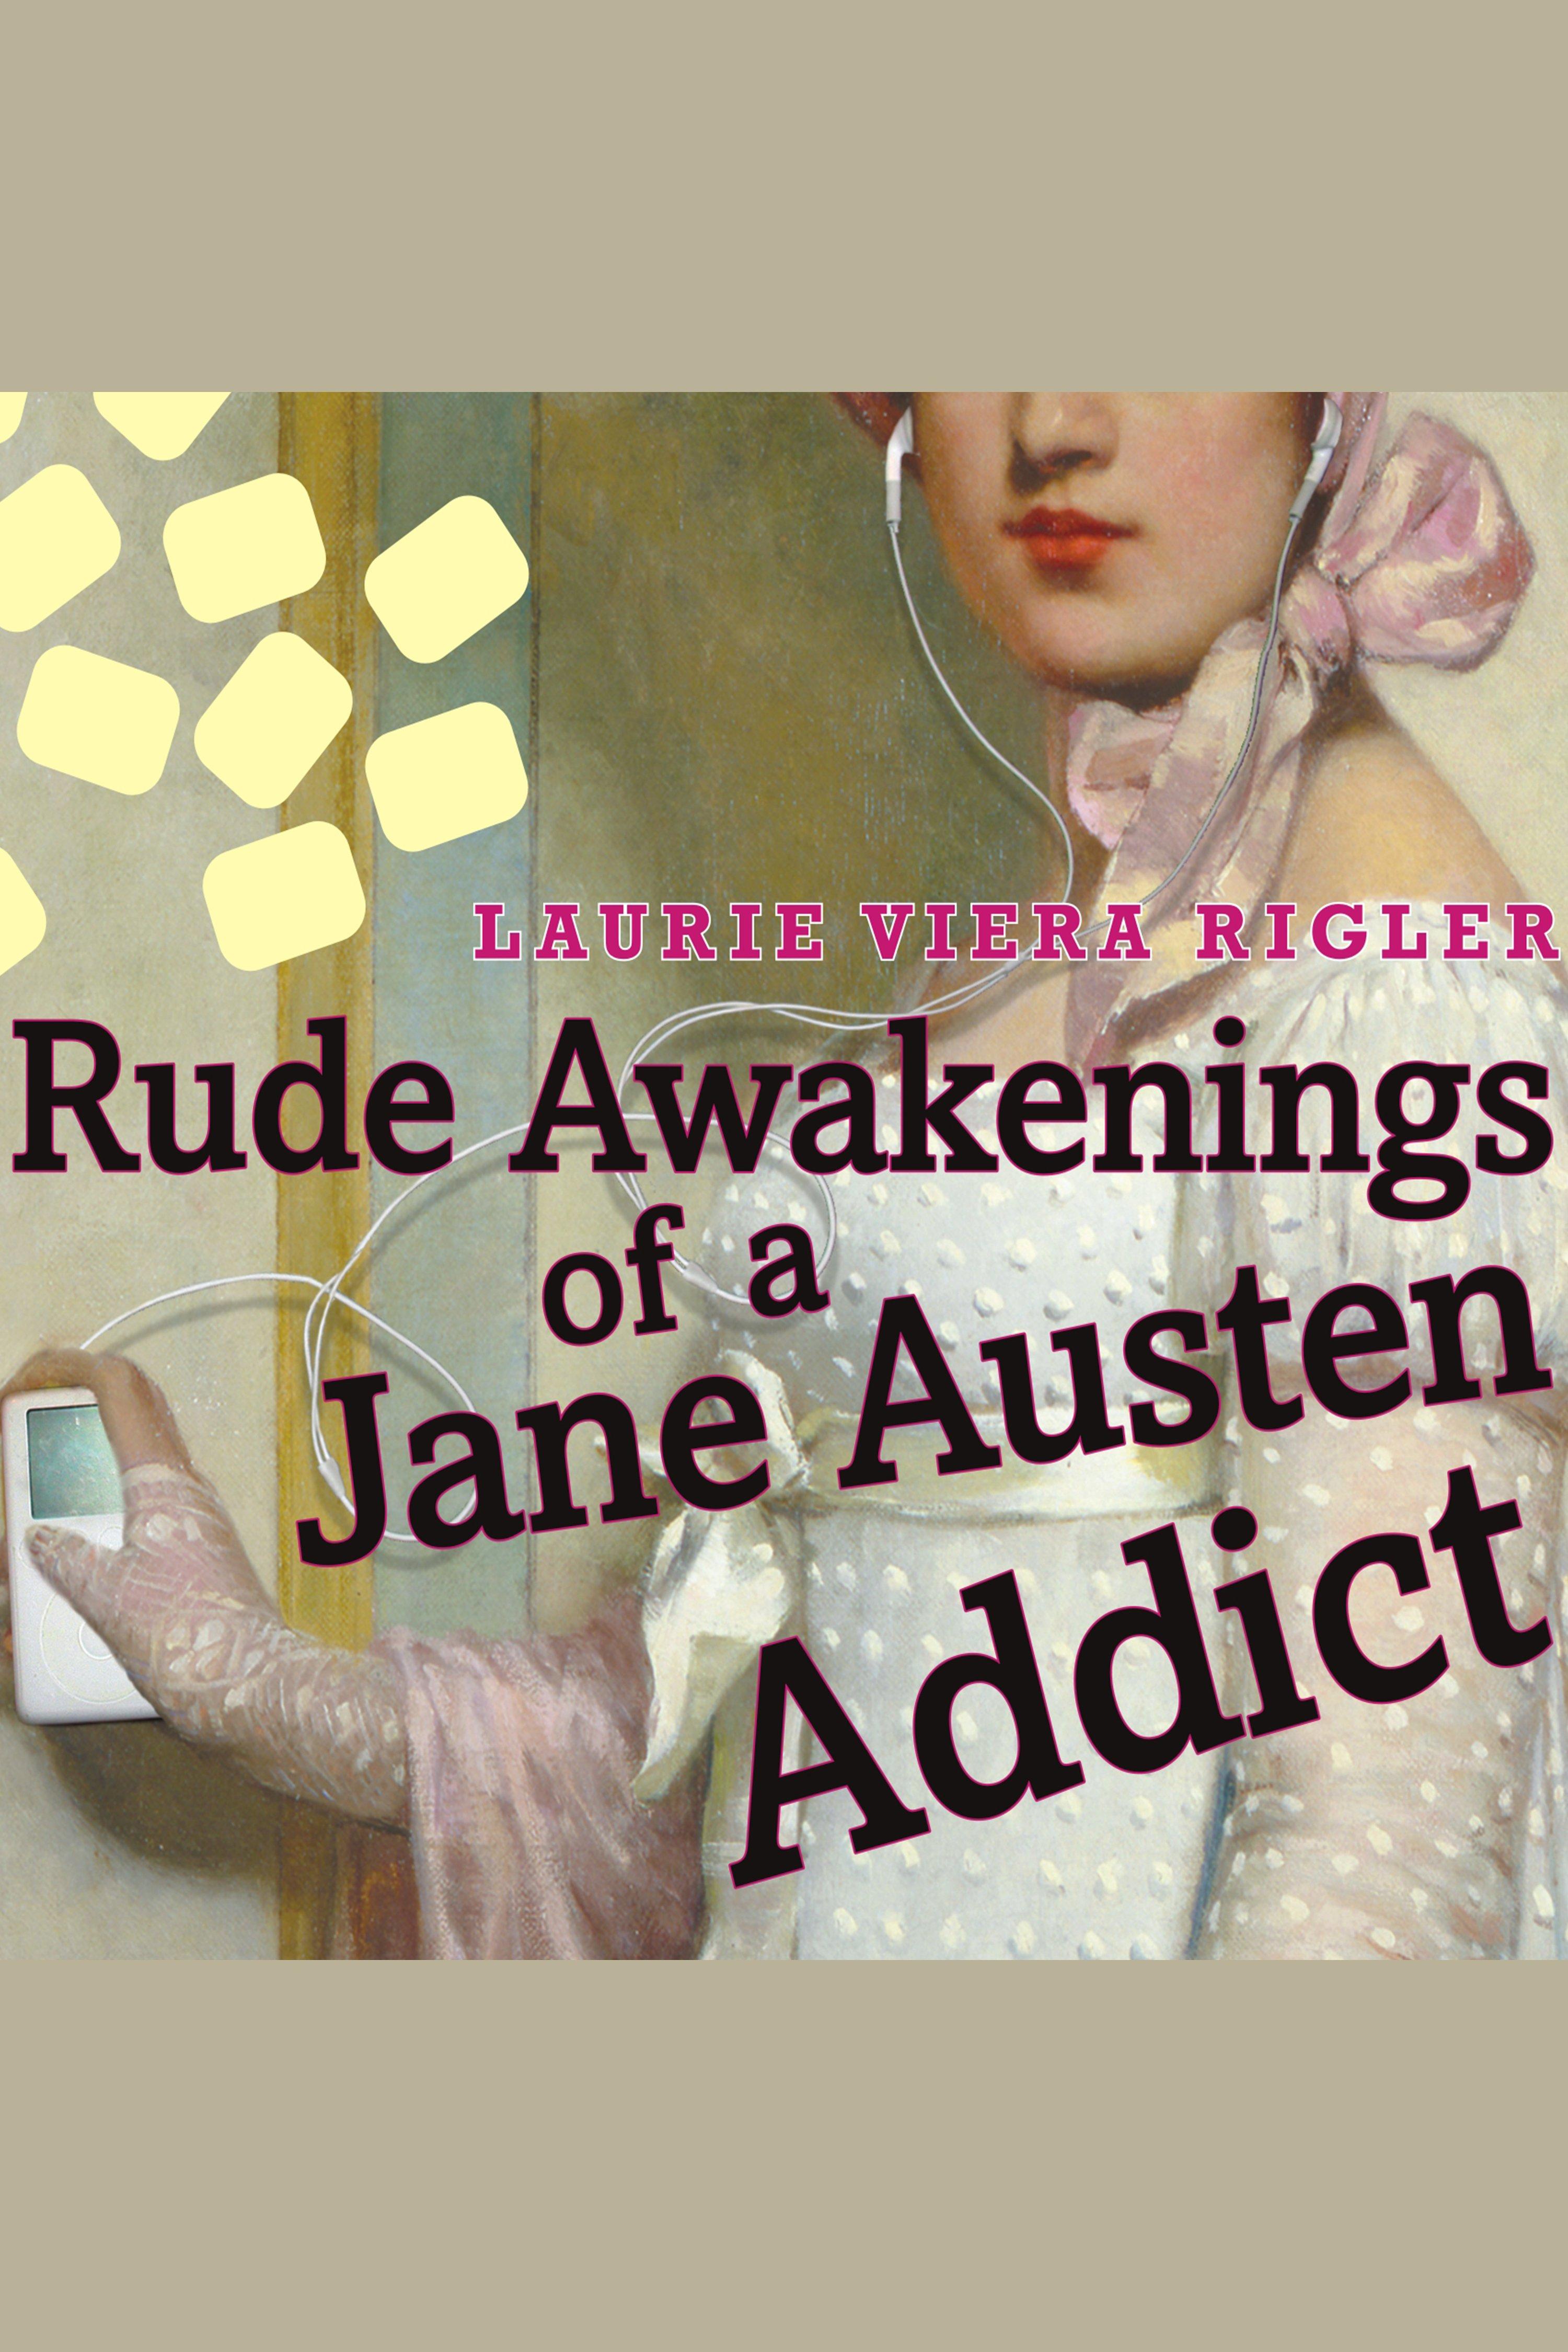 Rude awakenings of a Jane Austen addict cover image